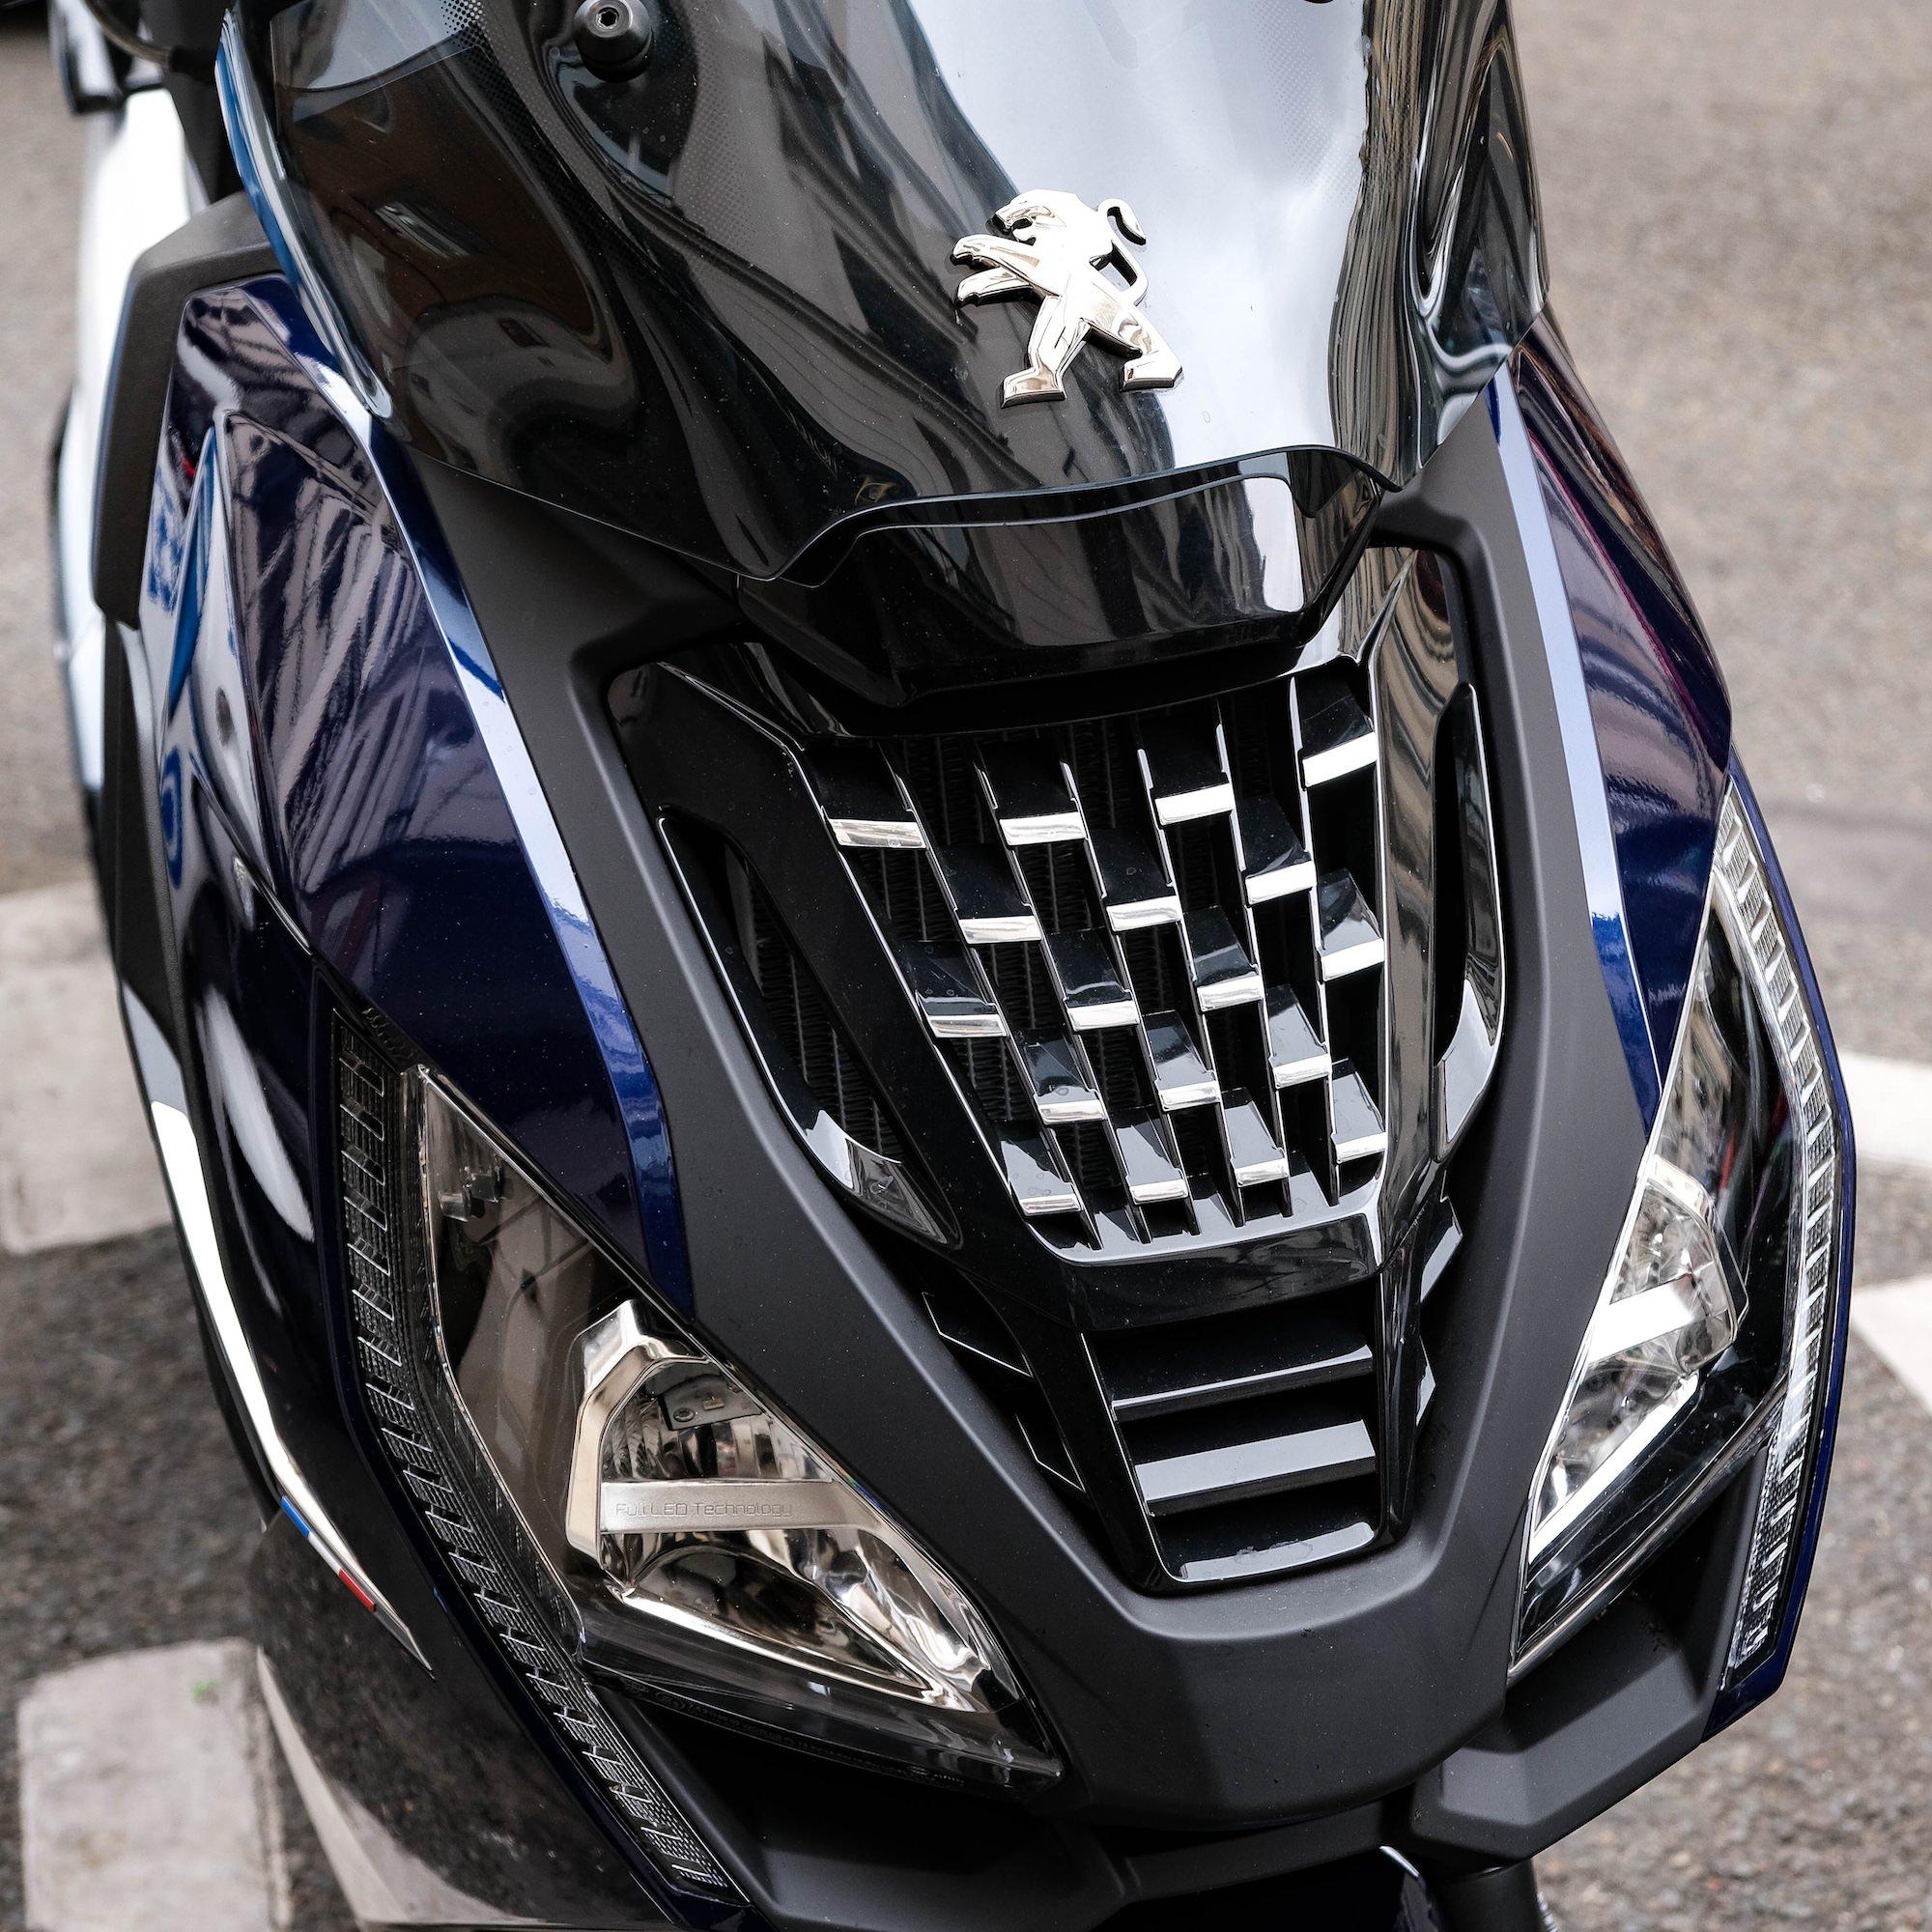 Peugeot Pulsion calandre avant